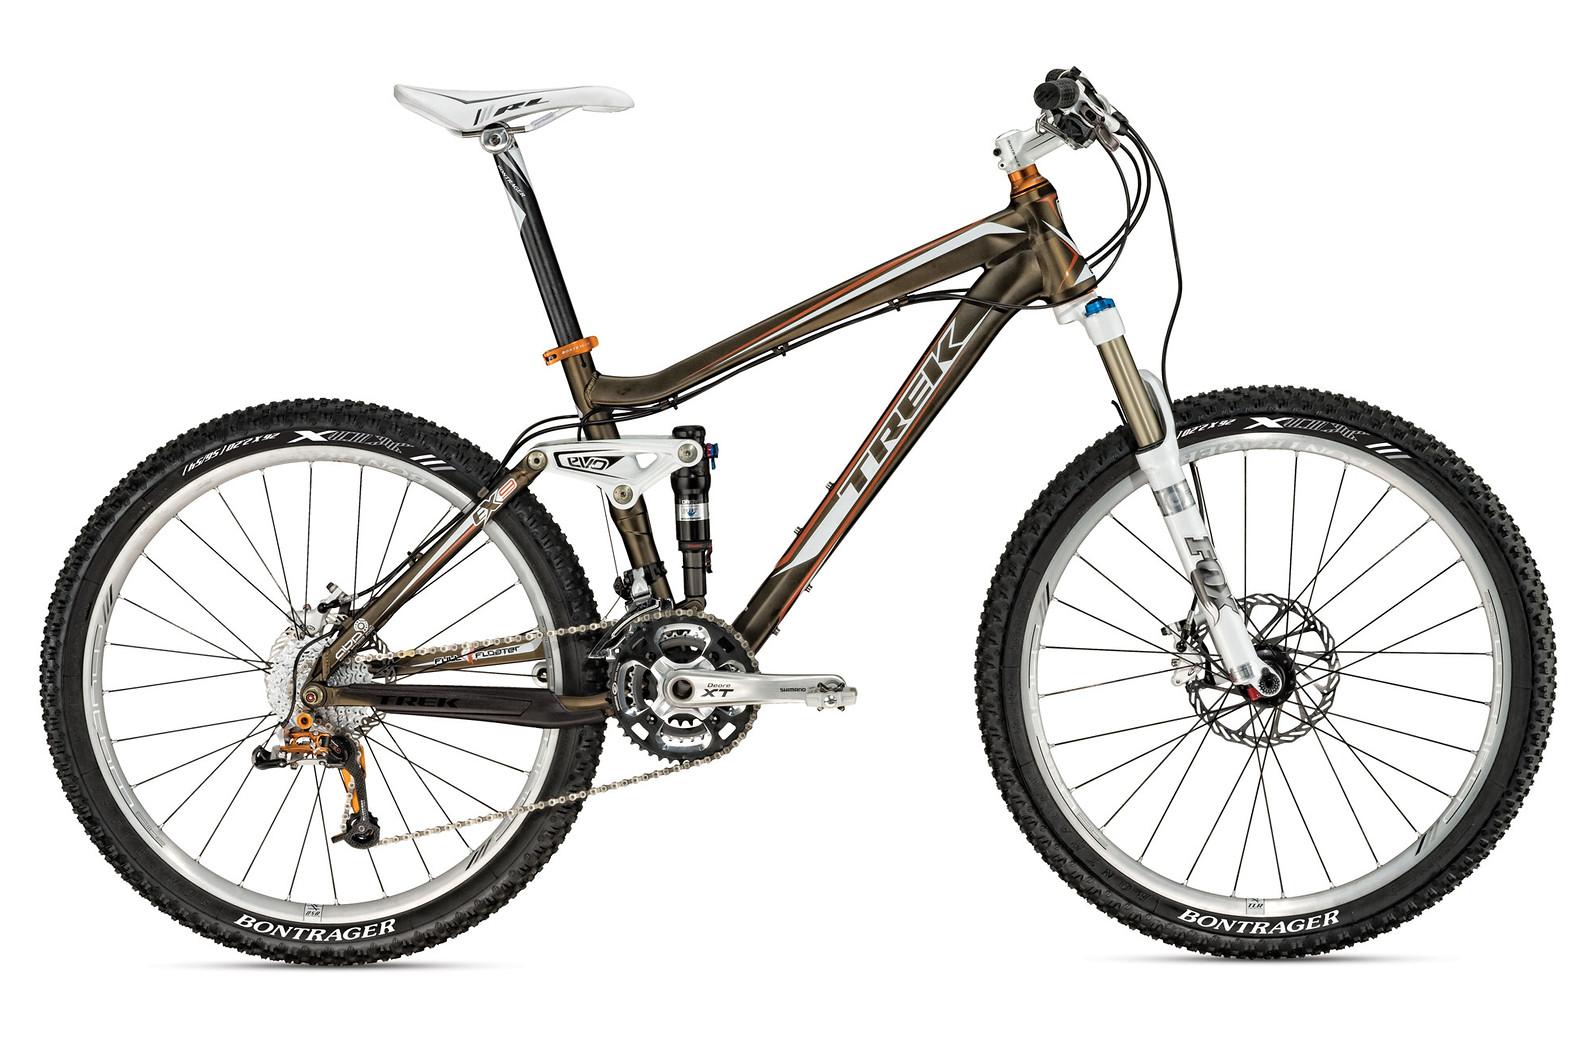 2010 Trek EX 9 Bike fuelex9_sepia